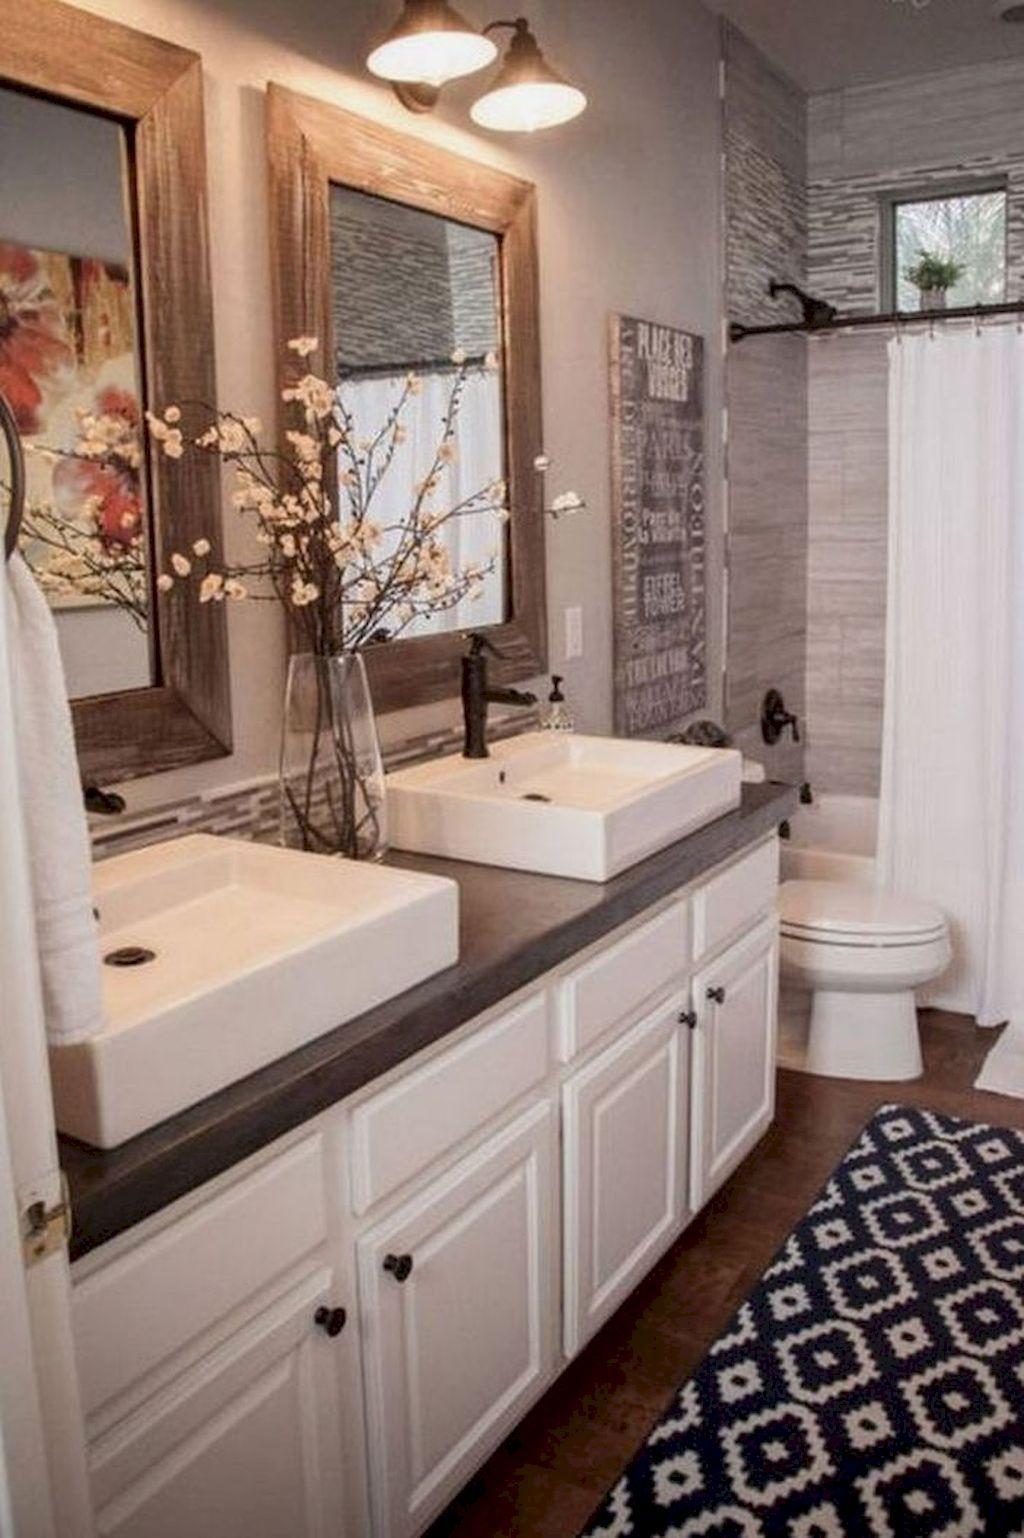 Badezimmer design neu awesome  small master bathroom remodel ideas  salle de bain